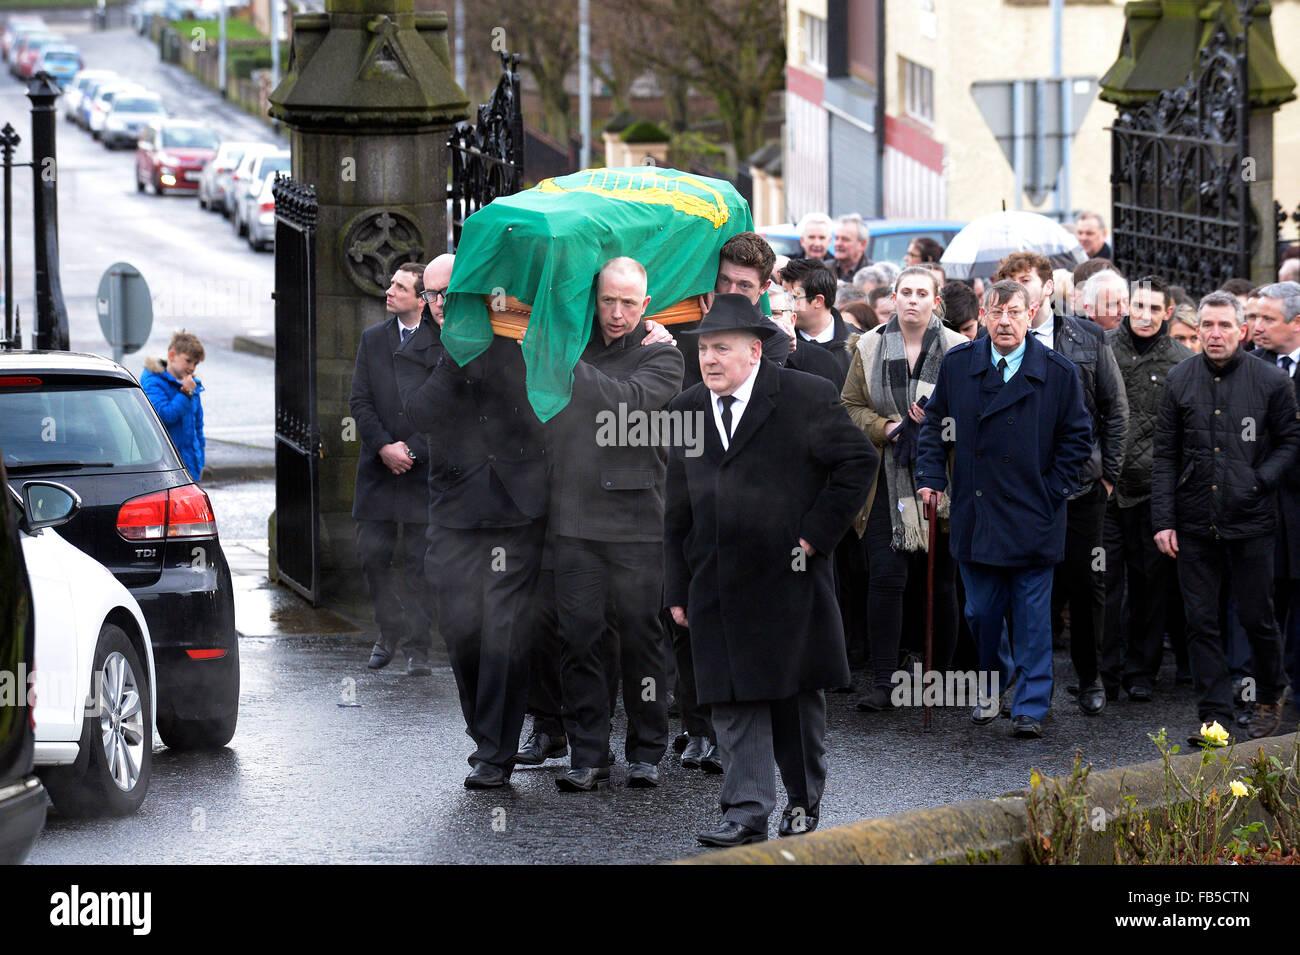 Coffin Irish Imágenes De Stock   Coffin Irish Fotos De Stock - Alamy 0ebe1a20bb4